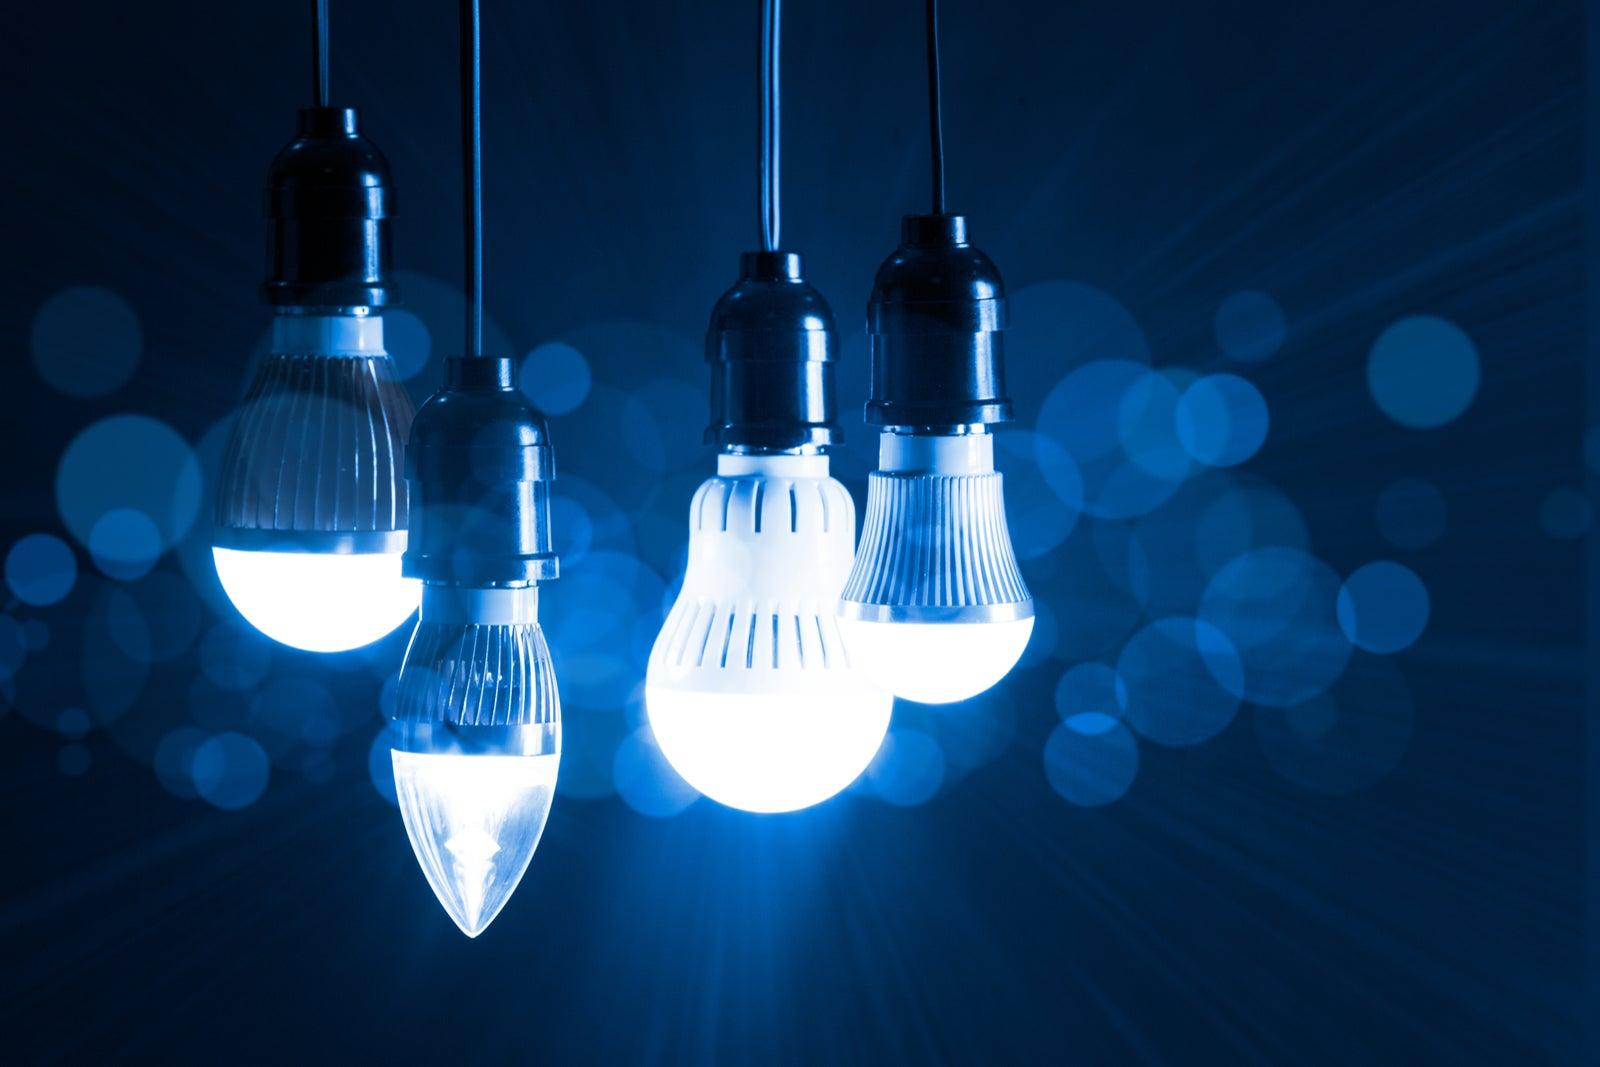 Bombillas LED: ¿son tan rentables como dicen?